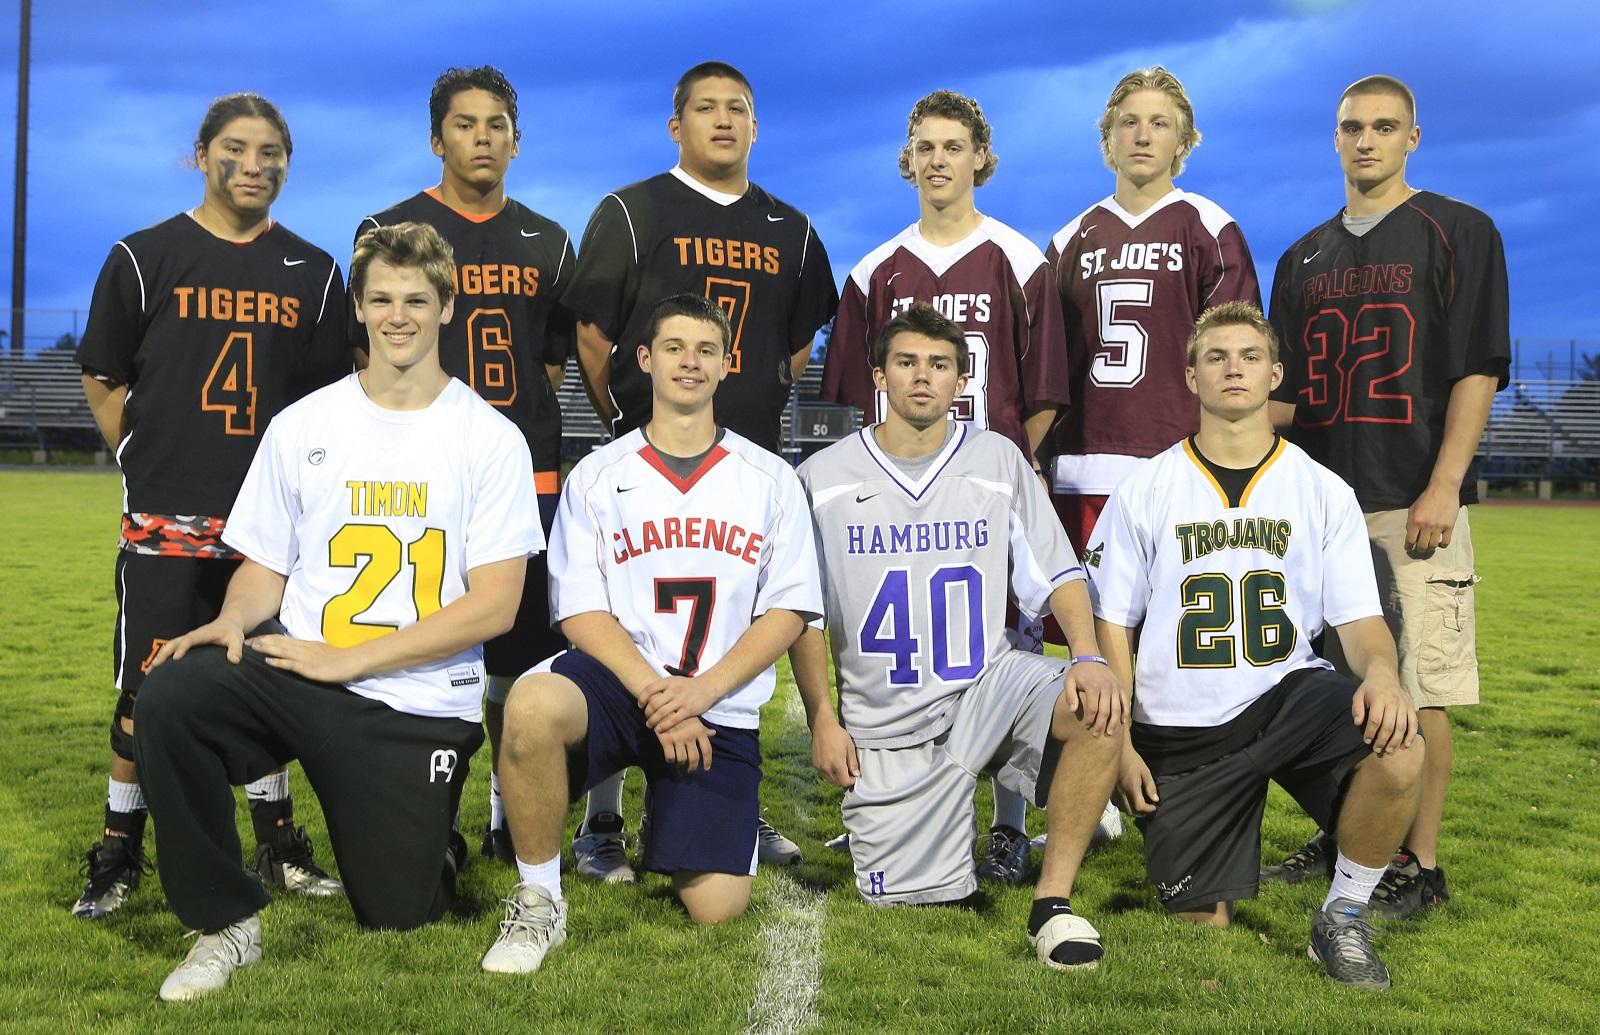 boys lacrosse honor roll all americans all league picks 2015 boys lacrosse honor roll all americans all league picks the buffalo news